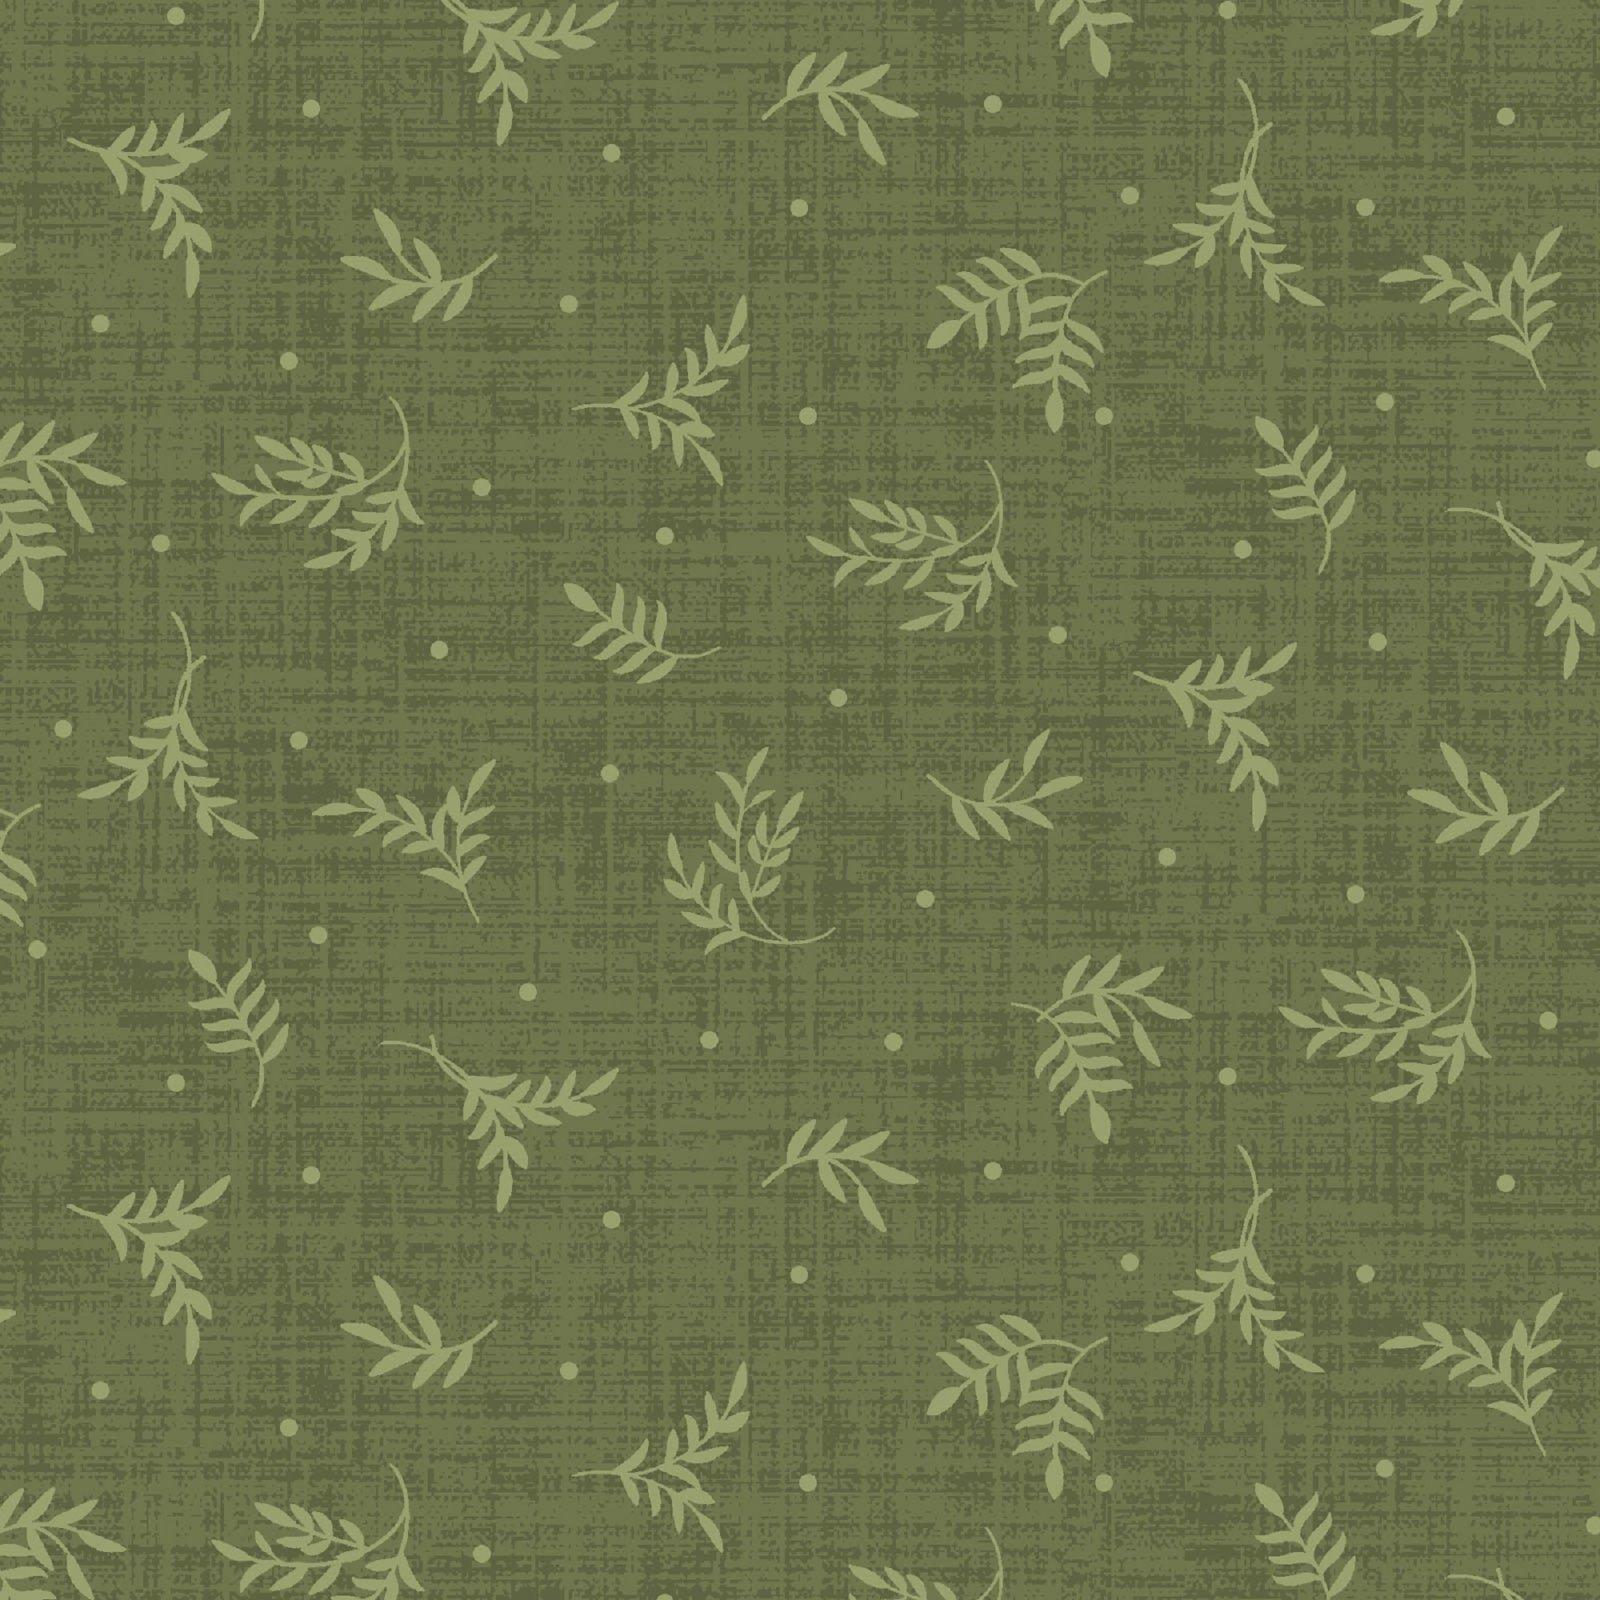 Flower & Vine - Branch - Green